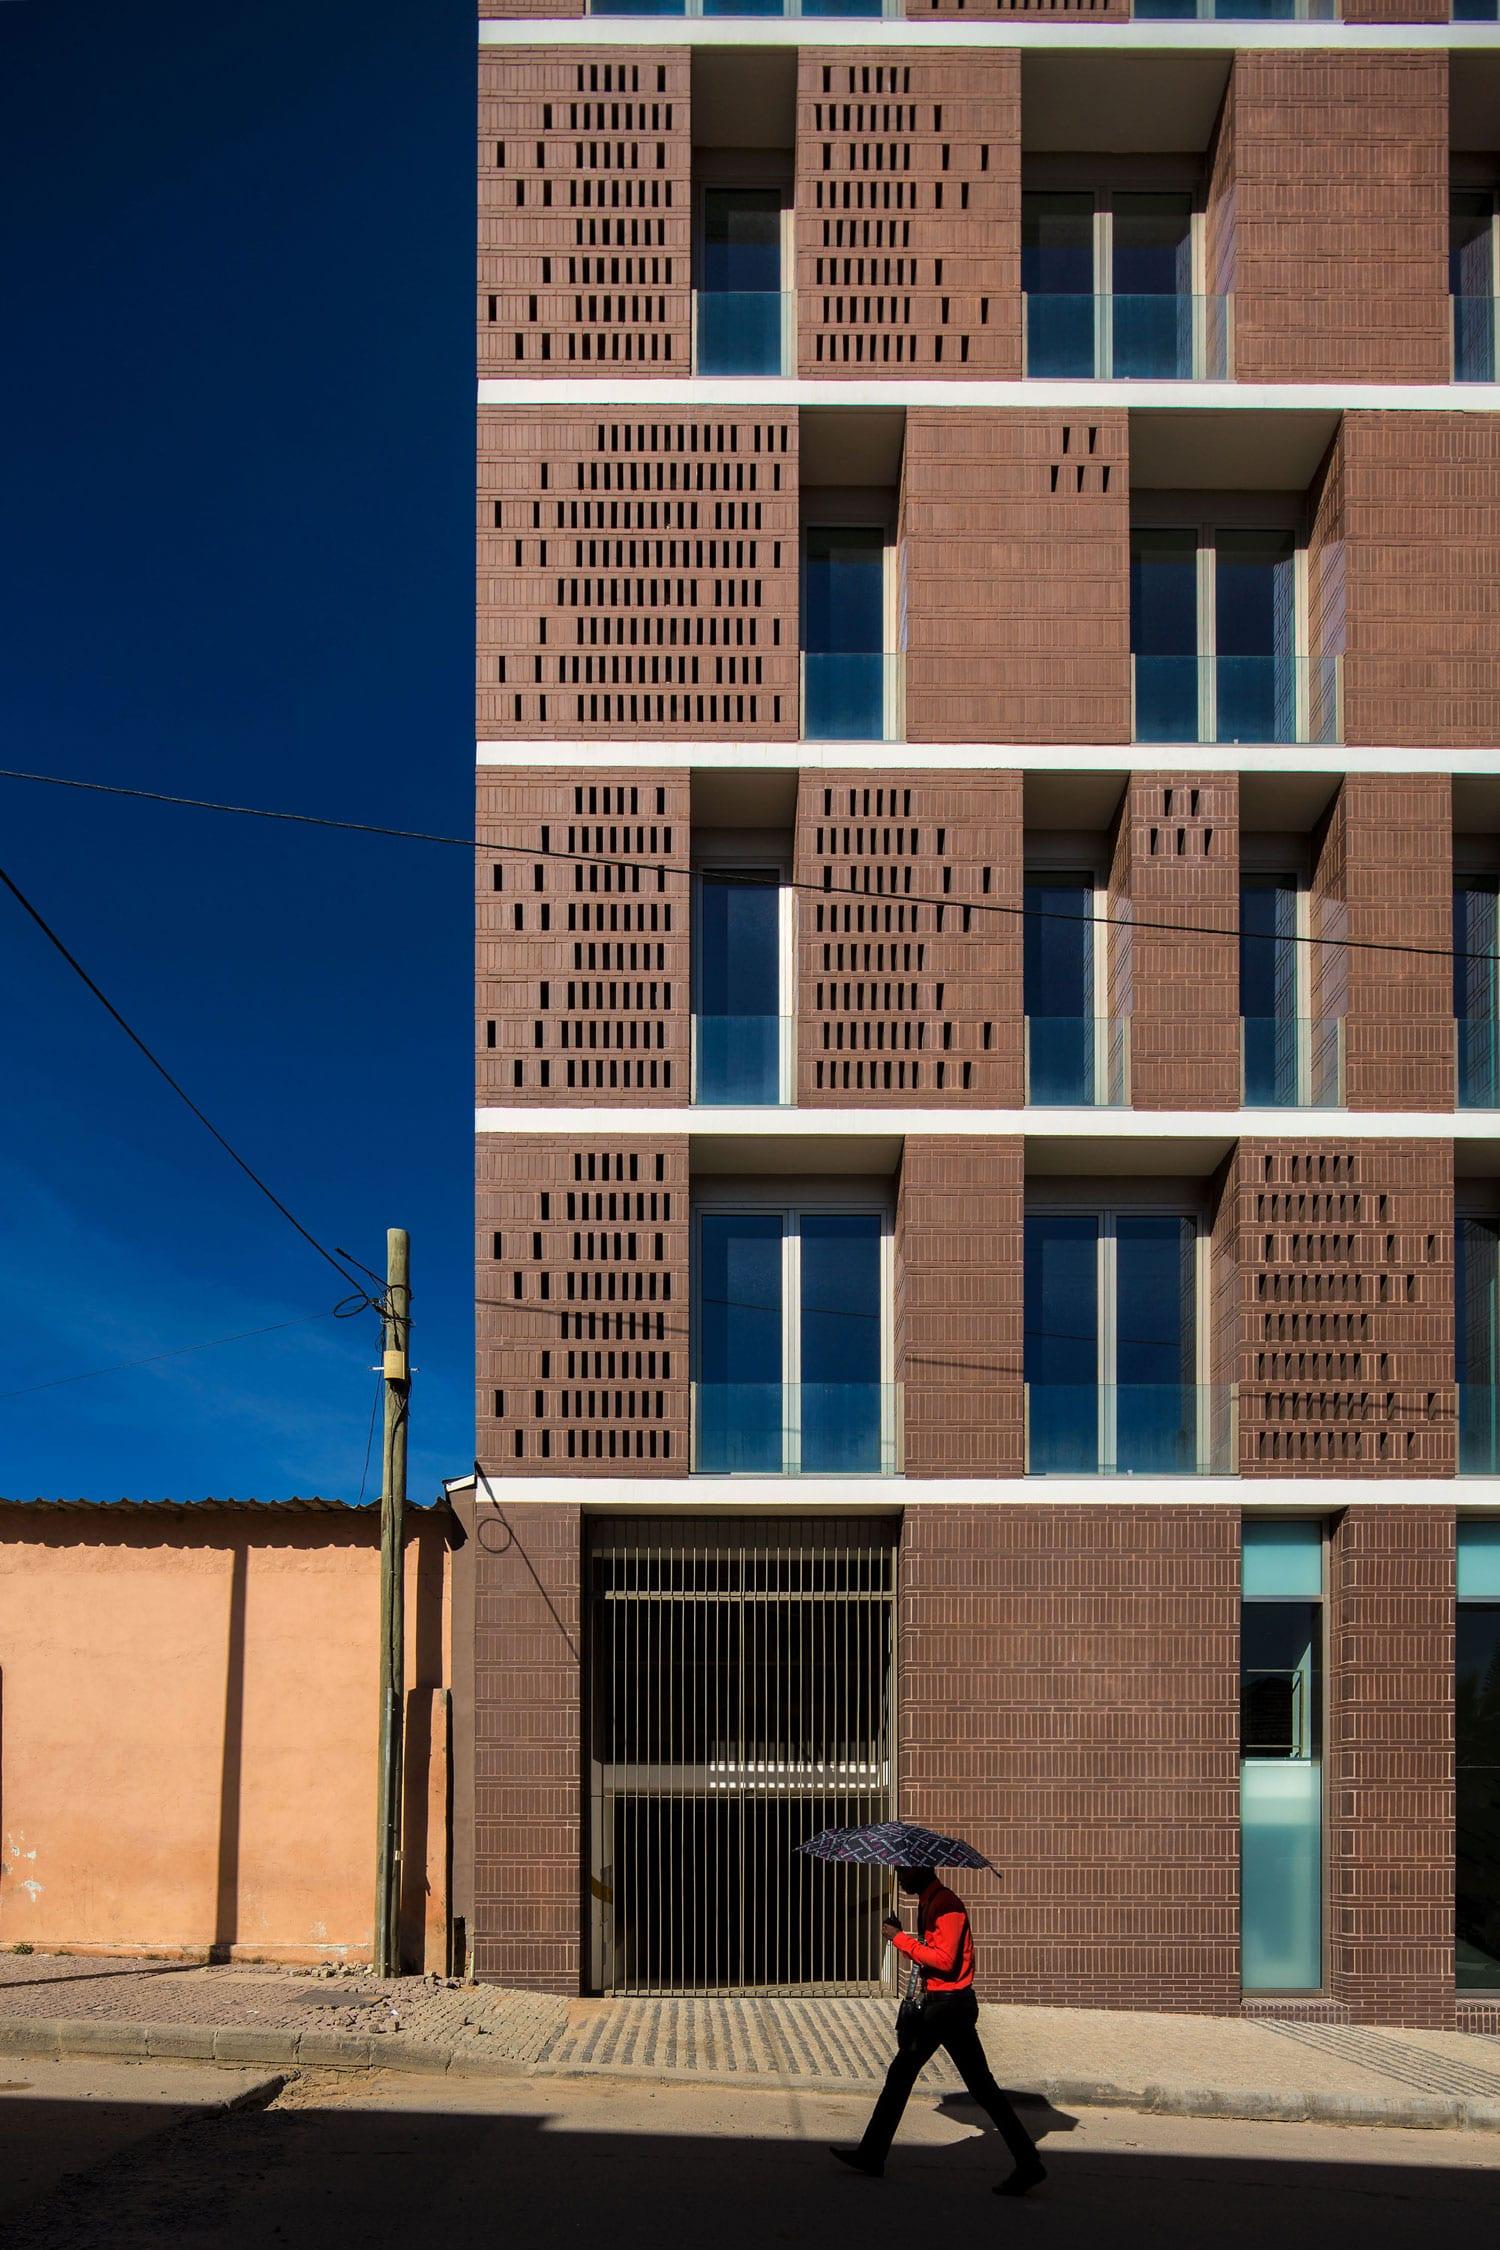 Lubango Centre by PROMONTORIO | Yellowtrace